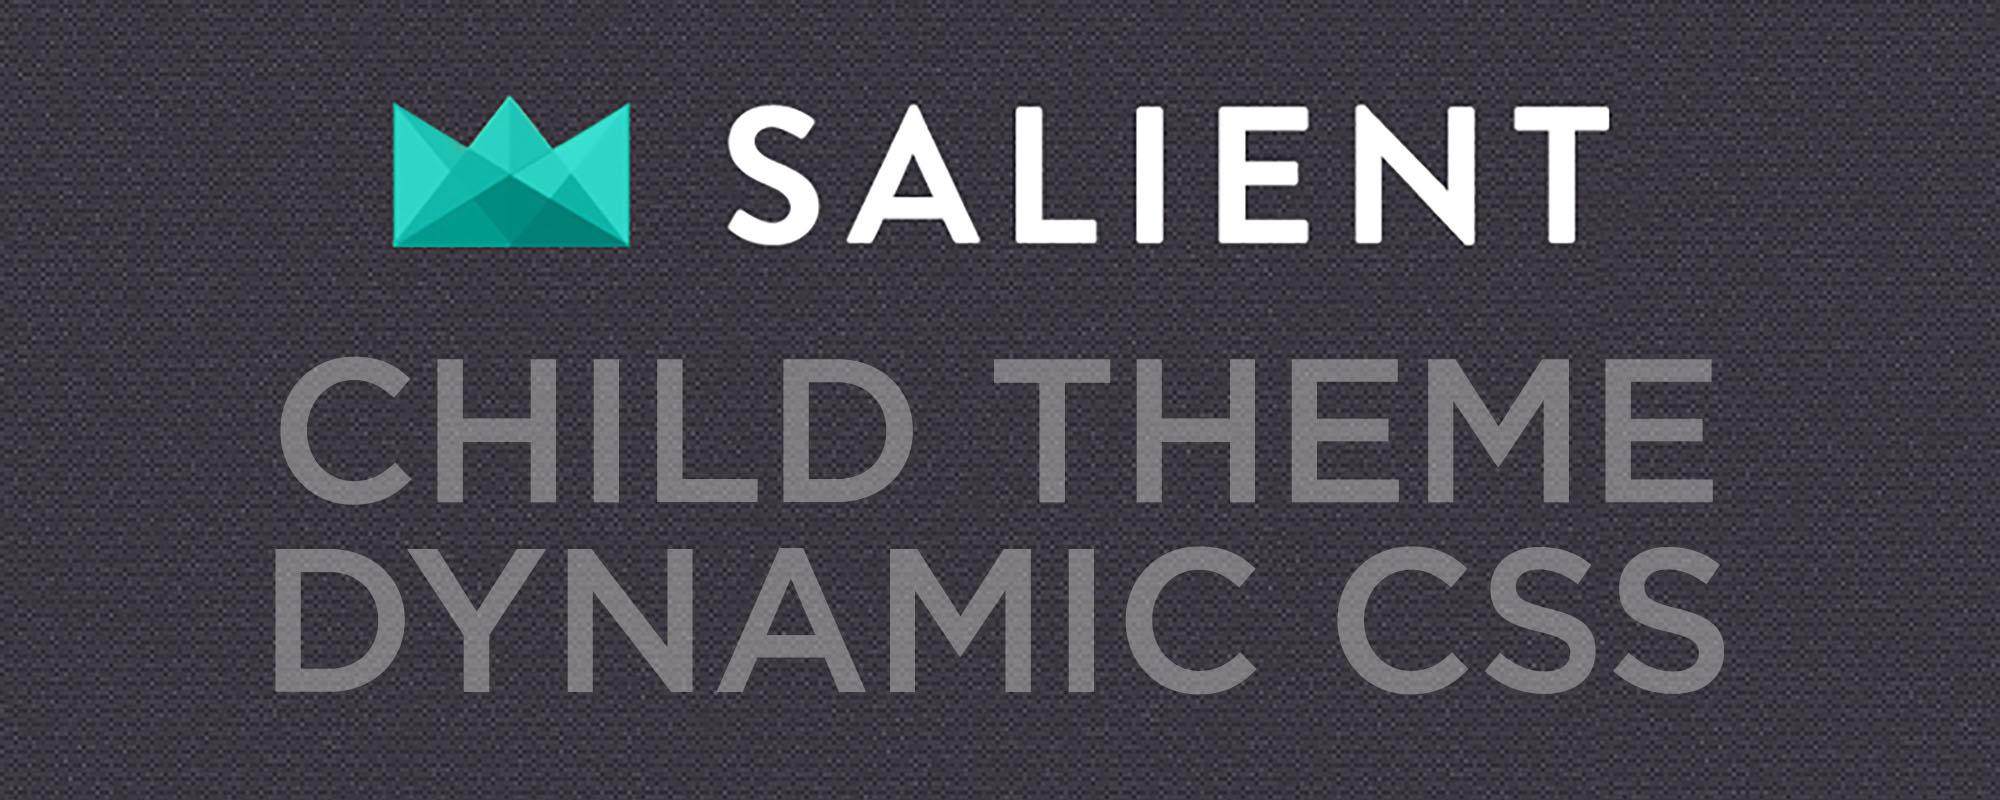 Salient Child Theme Dynamic CSS.